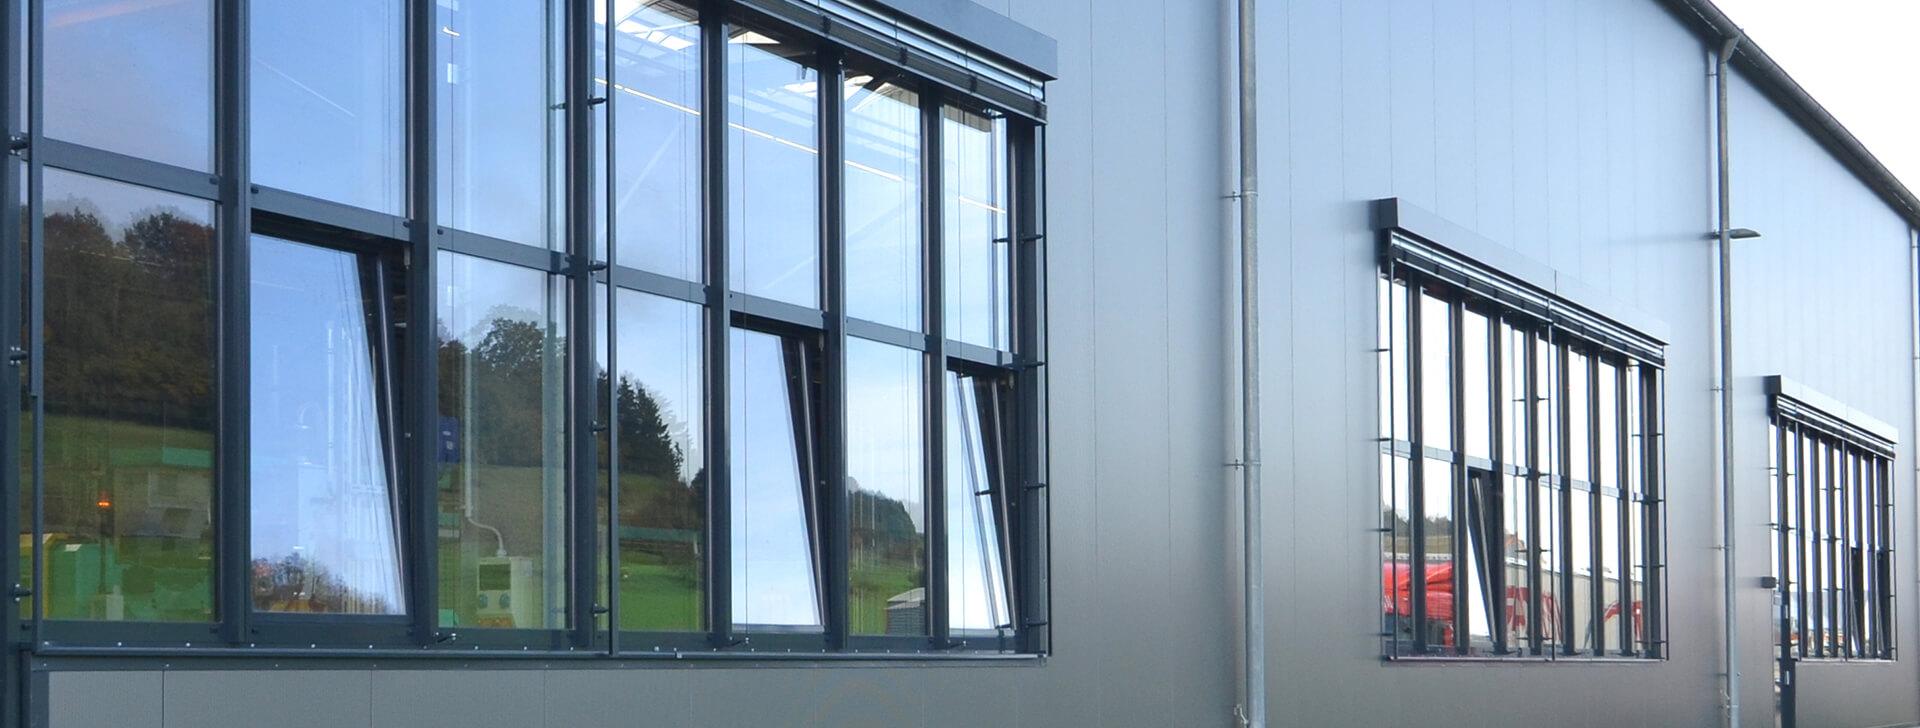 l ftung belichtung wand industriehallen b rofassaden. Black Bedroom Furniture Sets. Home Design Ideas